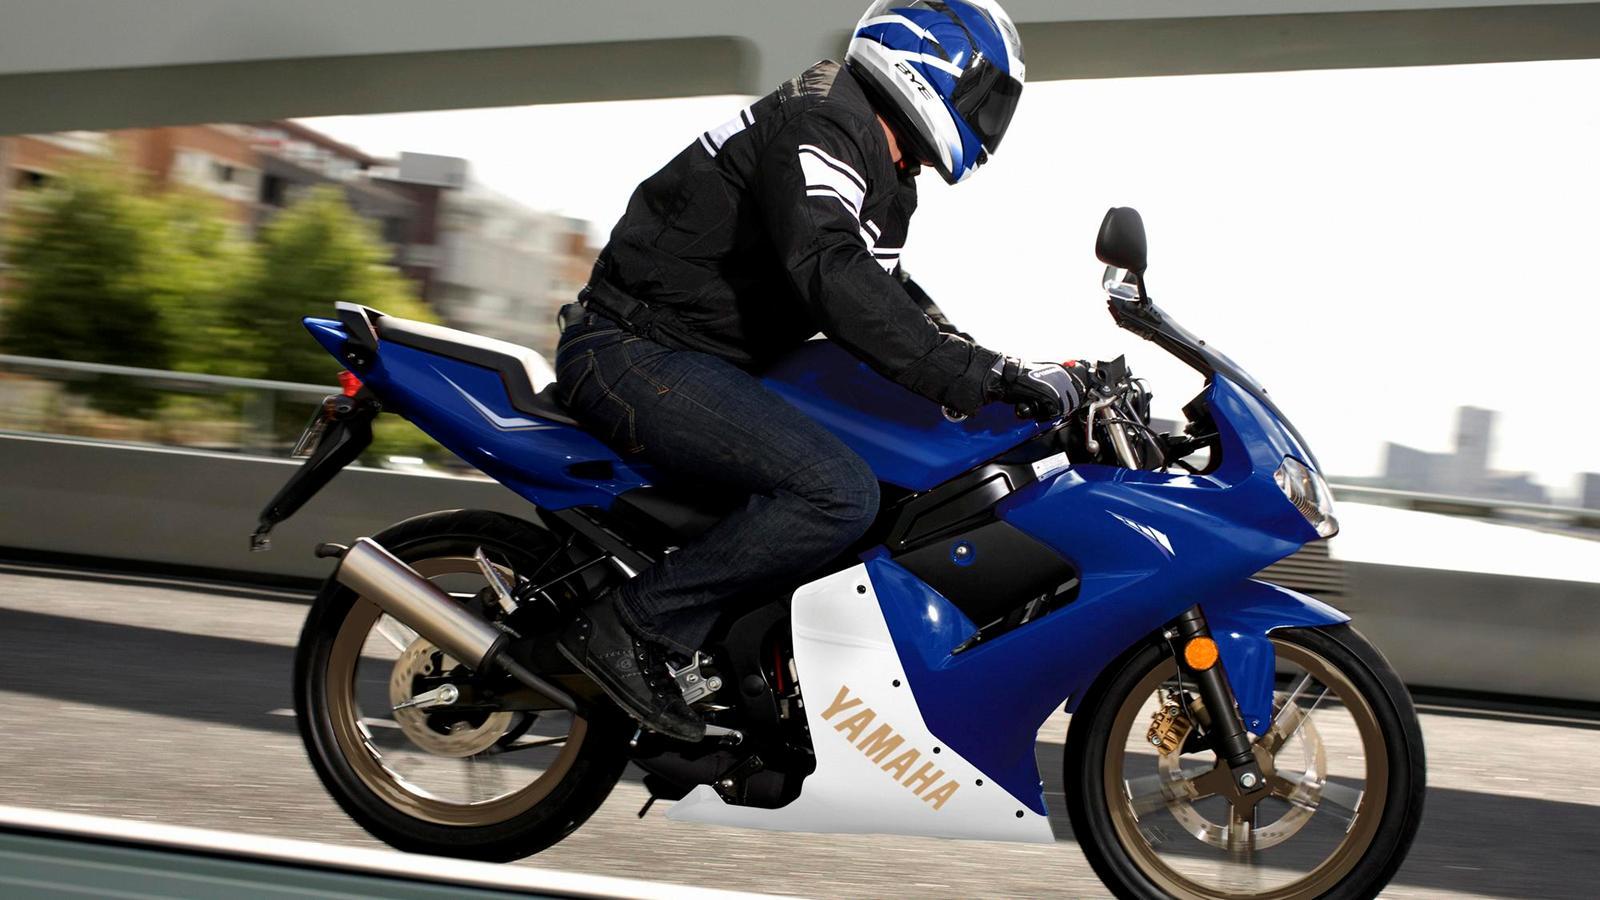 yamaha tzr 50 motorower przez du e m jedno motocykle skutery motorowery opinie forum. Black Bedroom Furniture Sets. Home Design Ideas